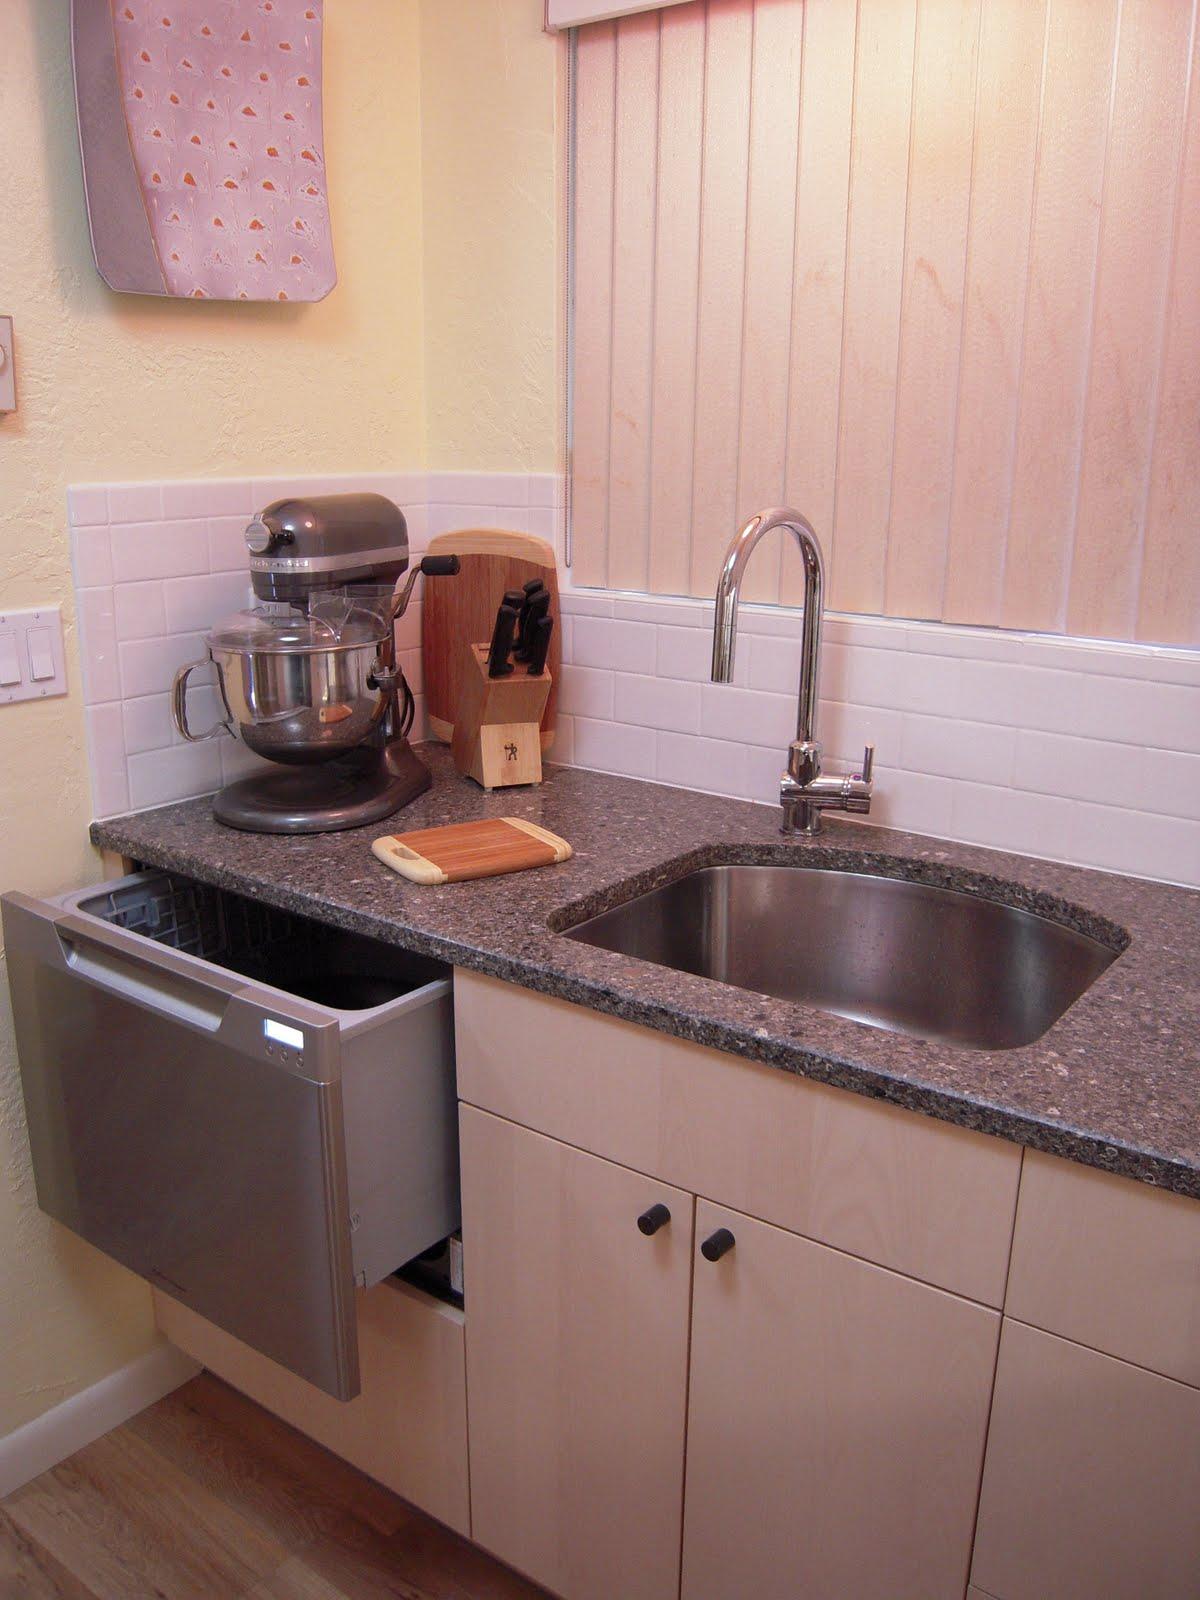 Whirlpool Dishwasher Gu1100 Whinning During Wash Why